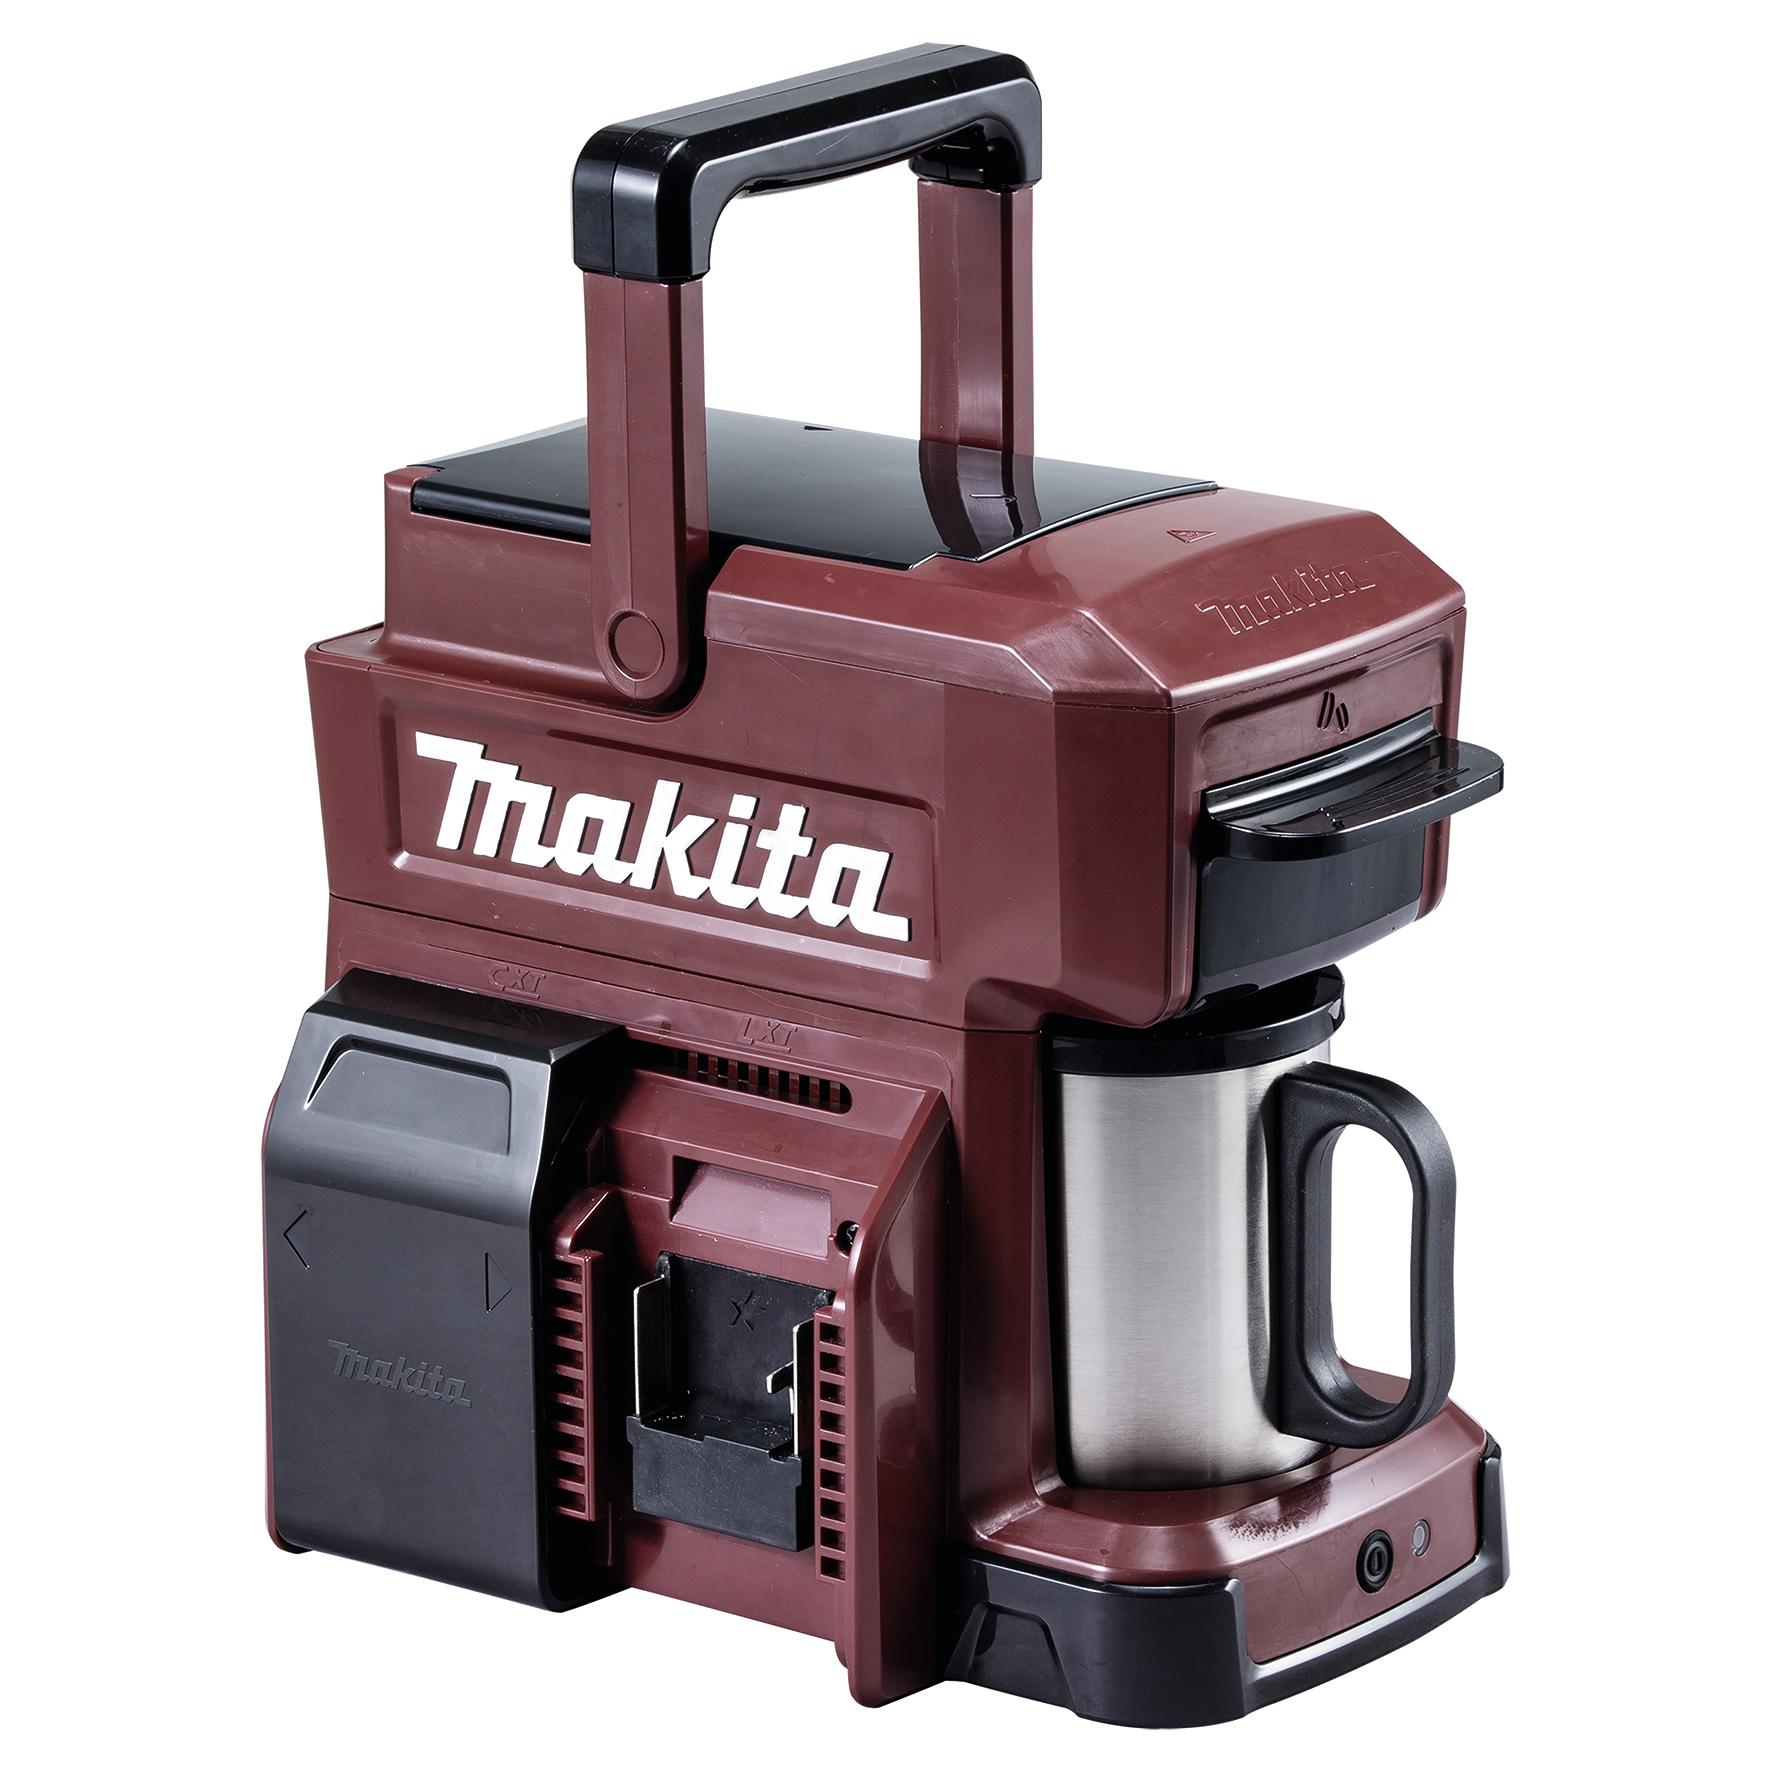 Akku-Werkzeugset Makita online kaufen